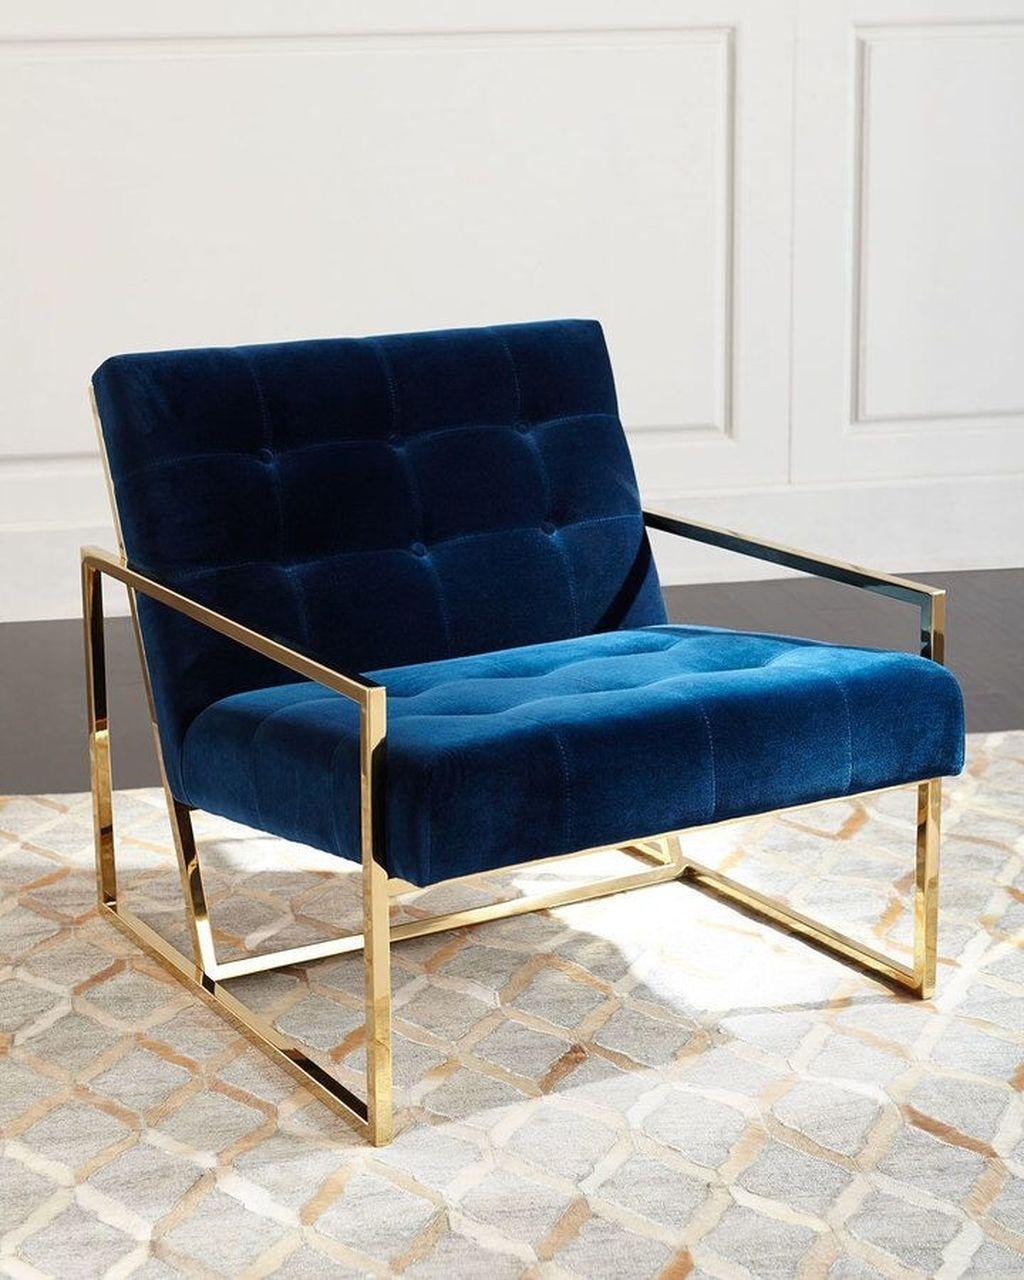 Mid century modern apartment decoration ideas 36